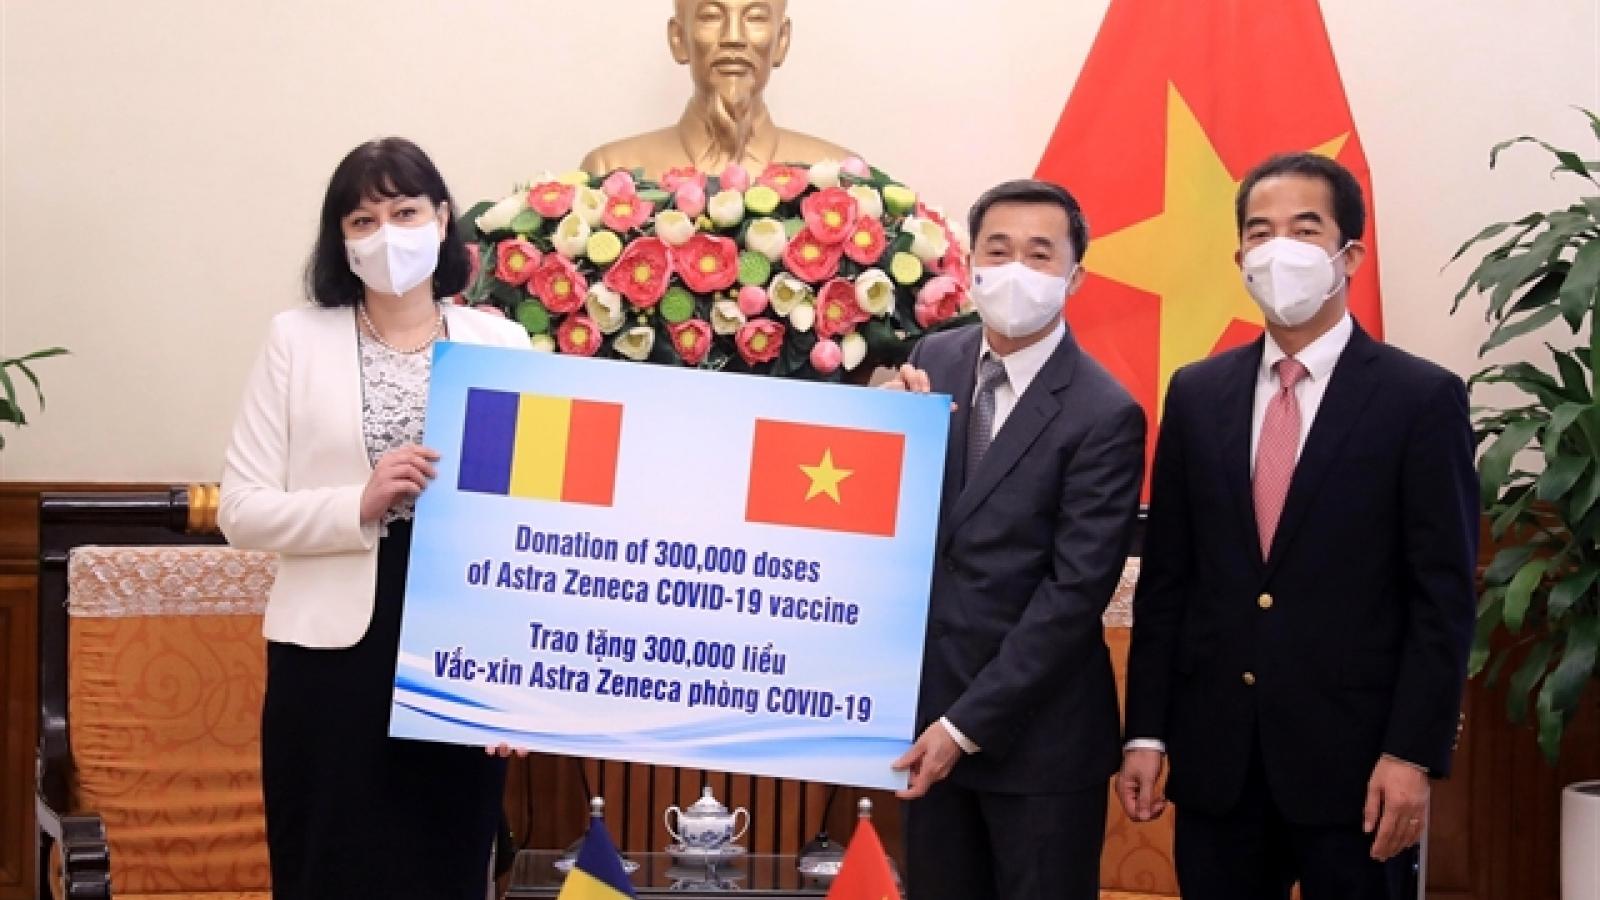 Vietnam receives 300,000 doses of AstraZeneca vaccine from Romania